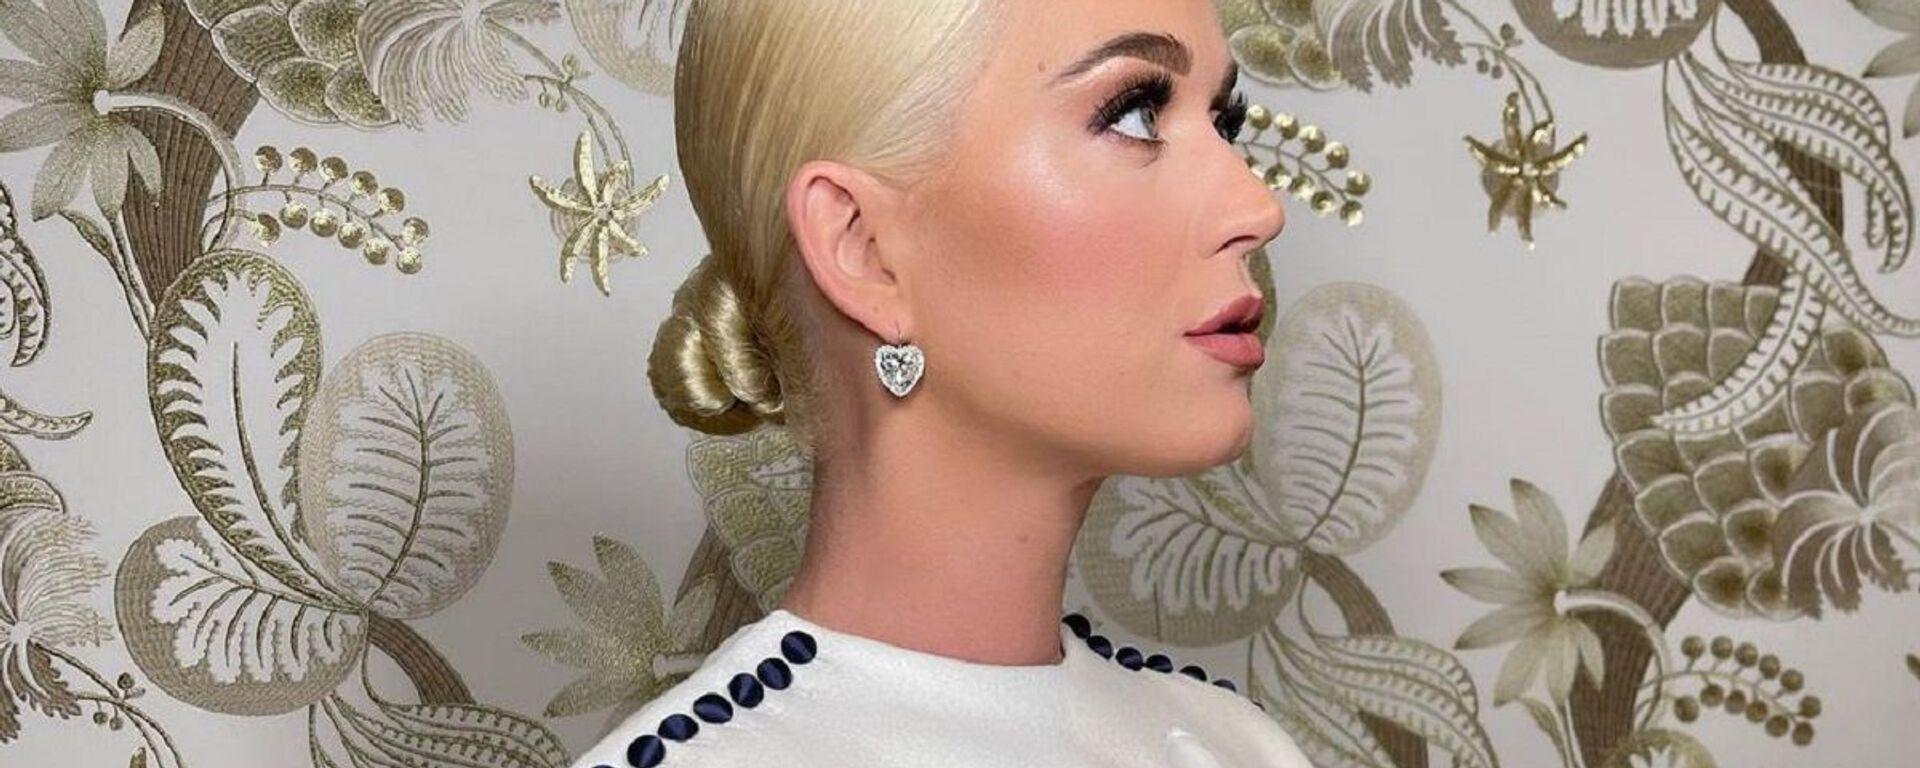 Katy Perry, cantante estadounidense - Sputnik Mundo, 1920, 21.01.2021